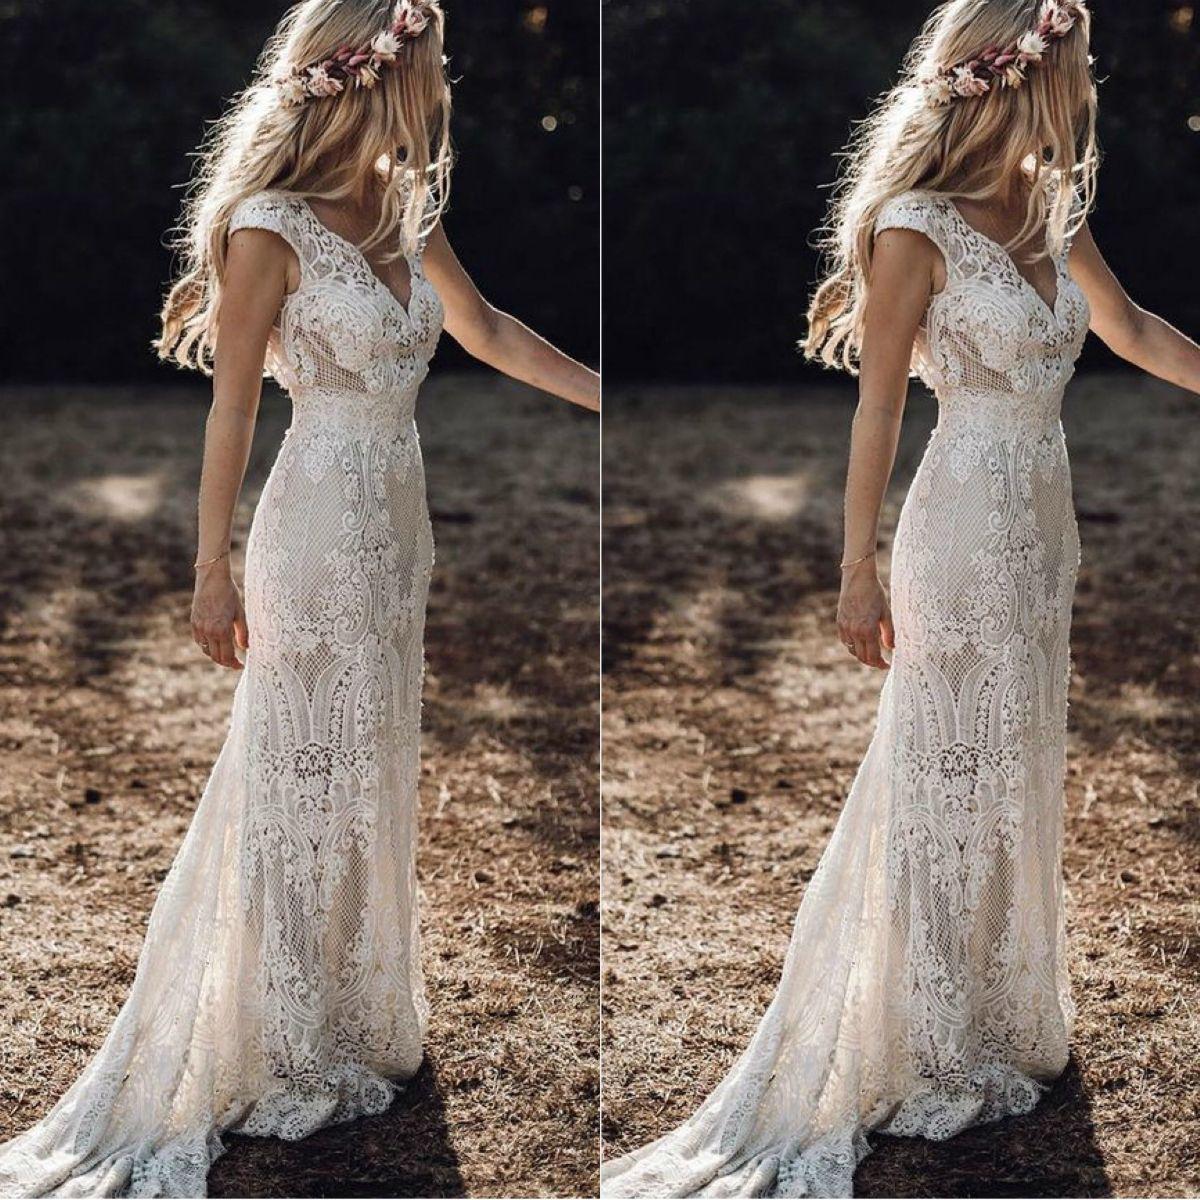 Vintage 2019 Berta Full Lace Mermaid Wedding Dresses V Neck Cap Sleeve Bridal Gowns Bohemian Beach Garden Custom Made vestido de novia